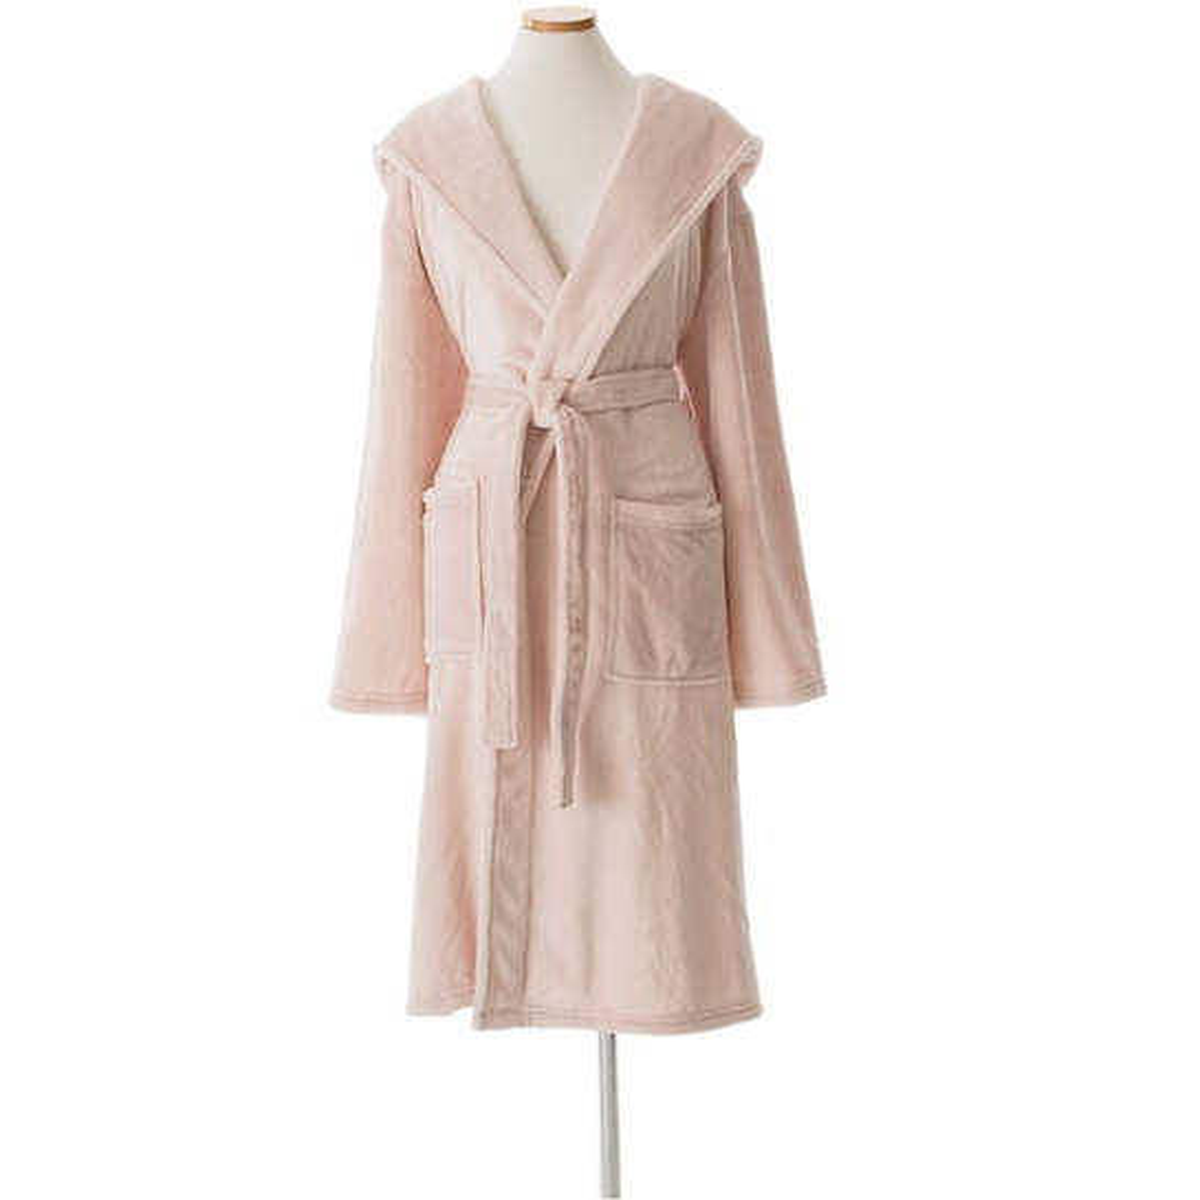 Selke Fleece Slipper Pink Hooded Robe